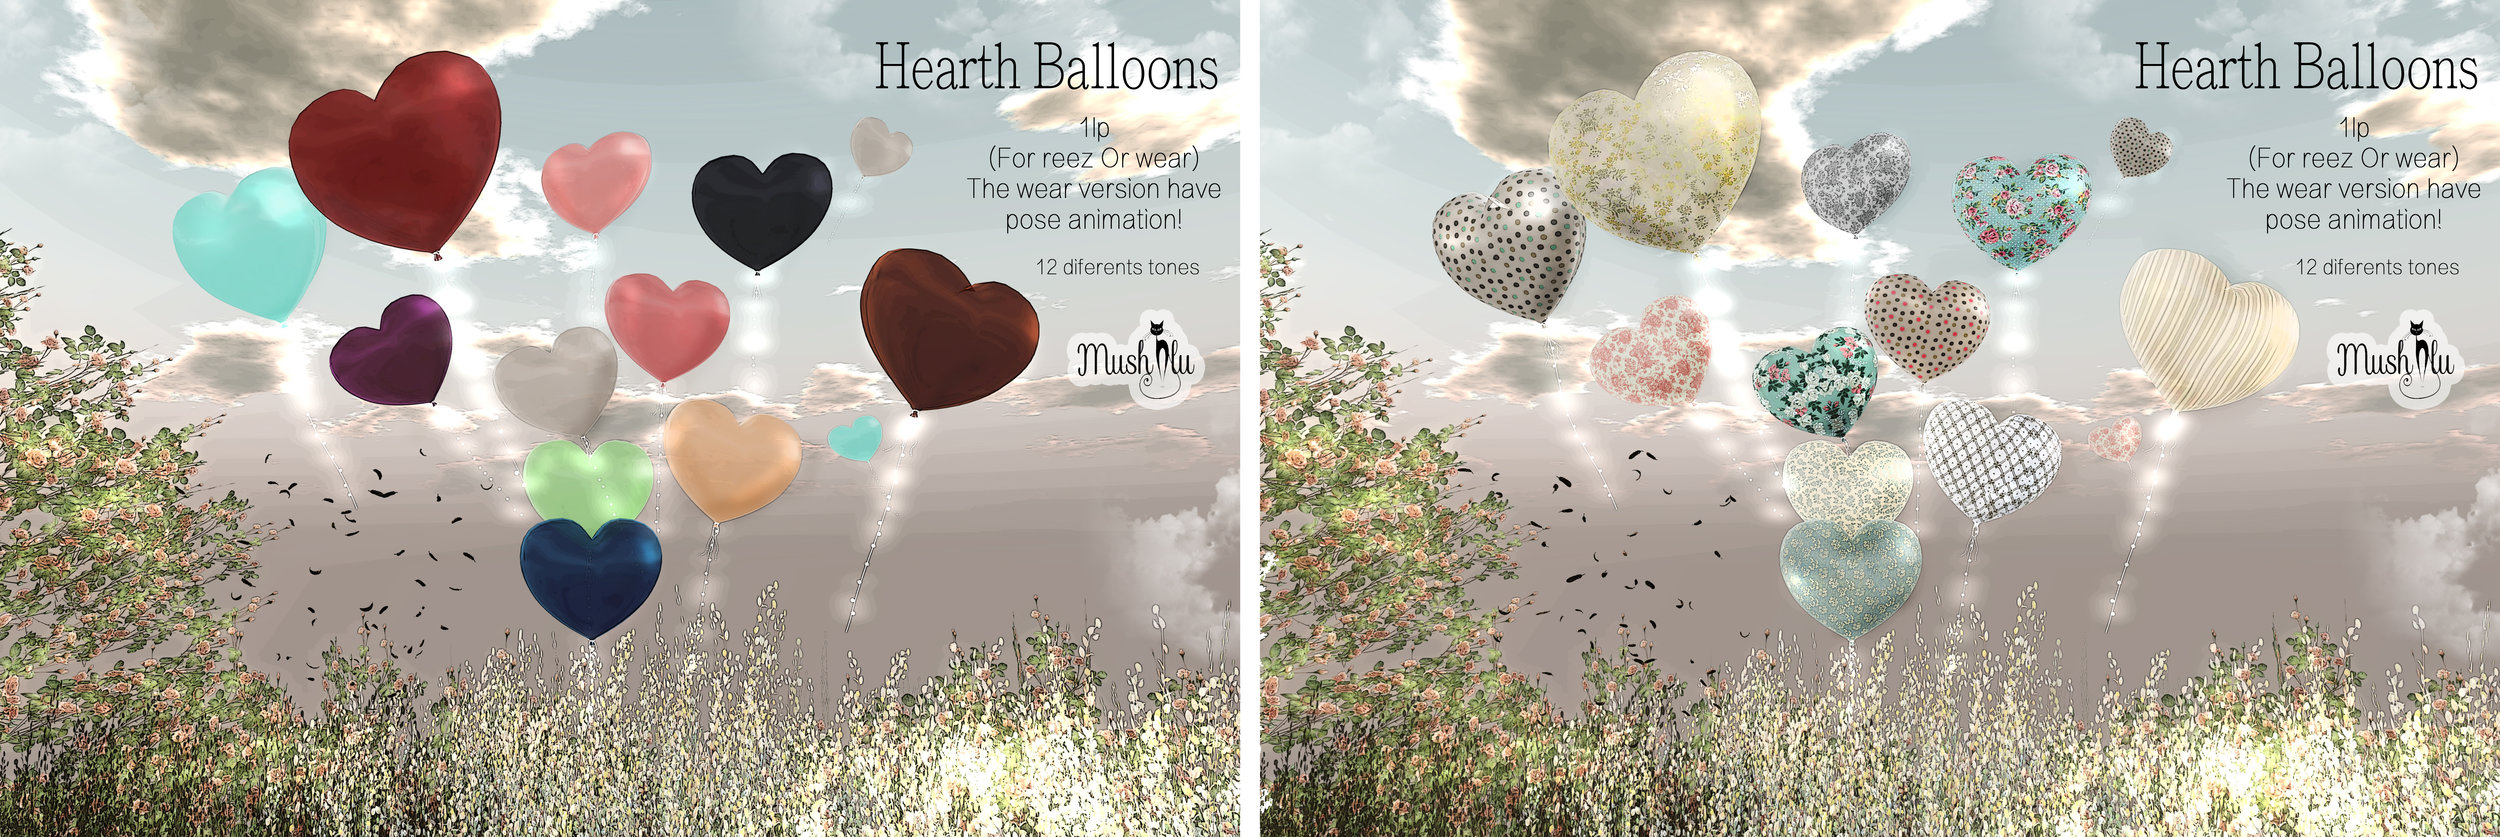 heart Ballons promo flick.jpg